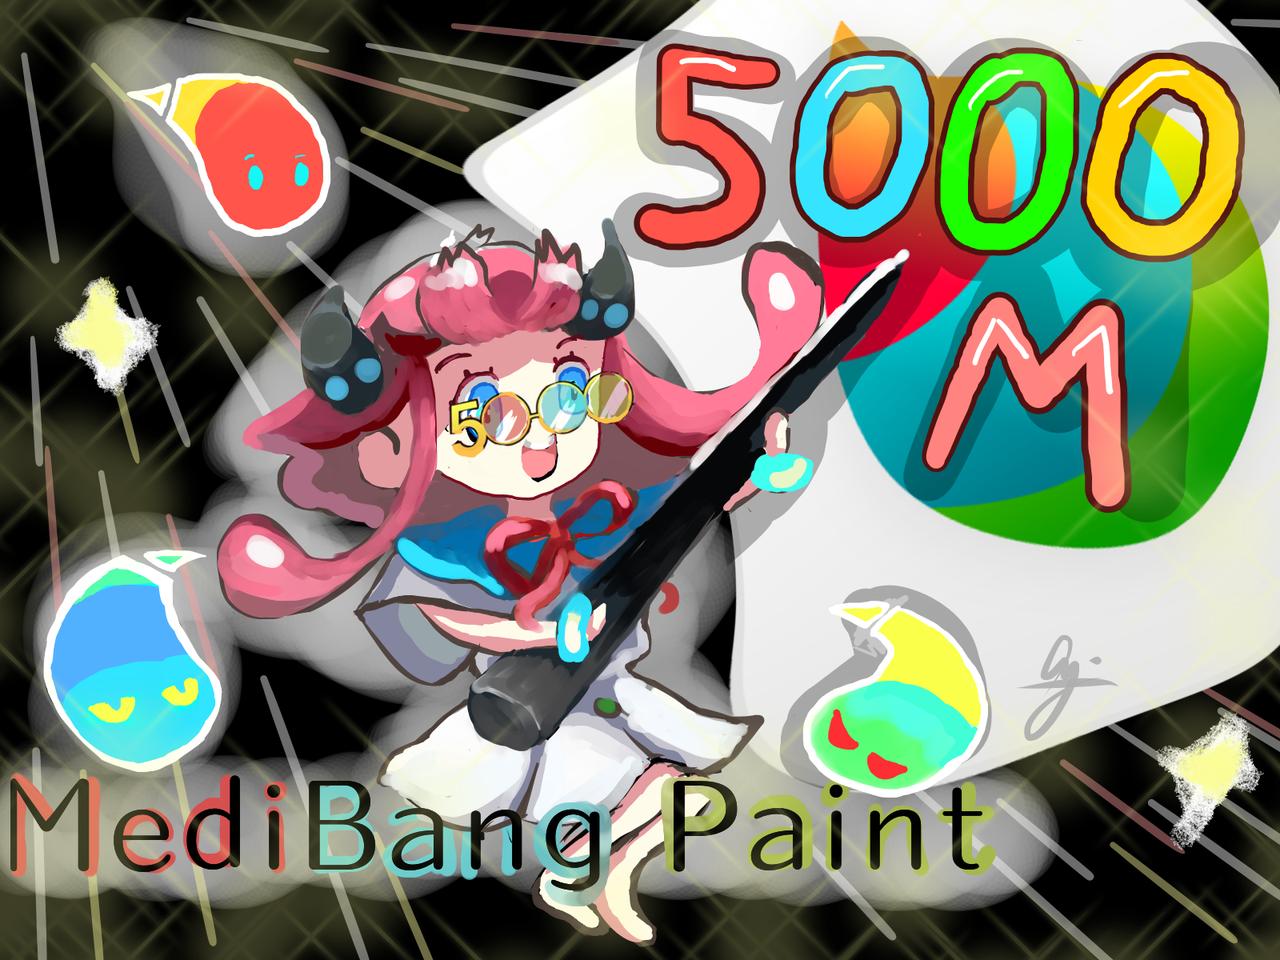 MediBang Paint 5000M ! Illust of 四眼✰金魚 medibangpaint medibangpaint5000